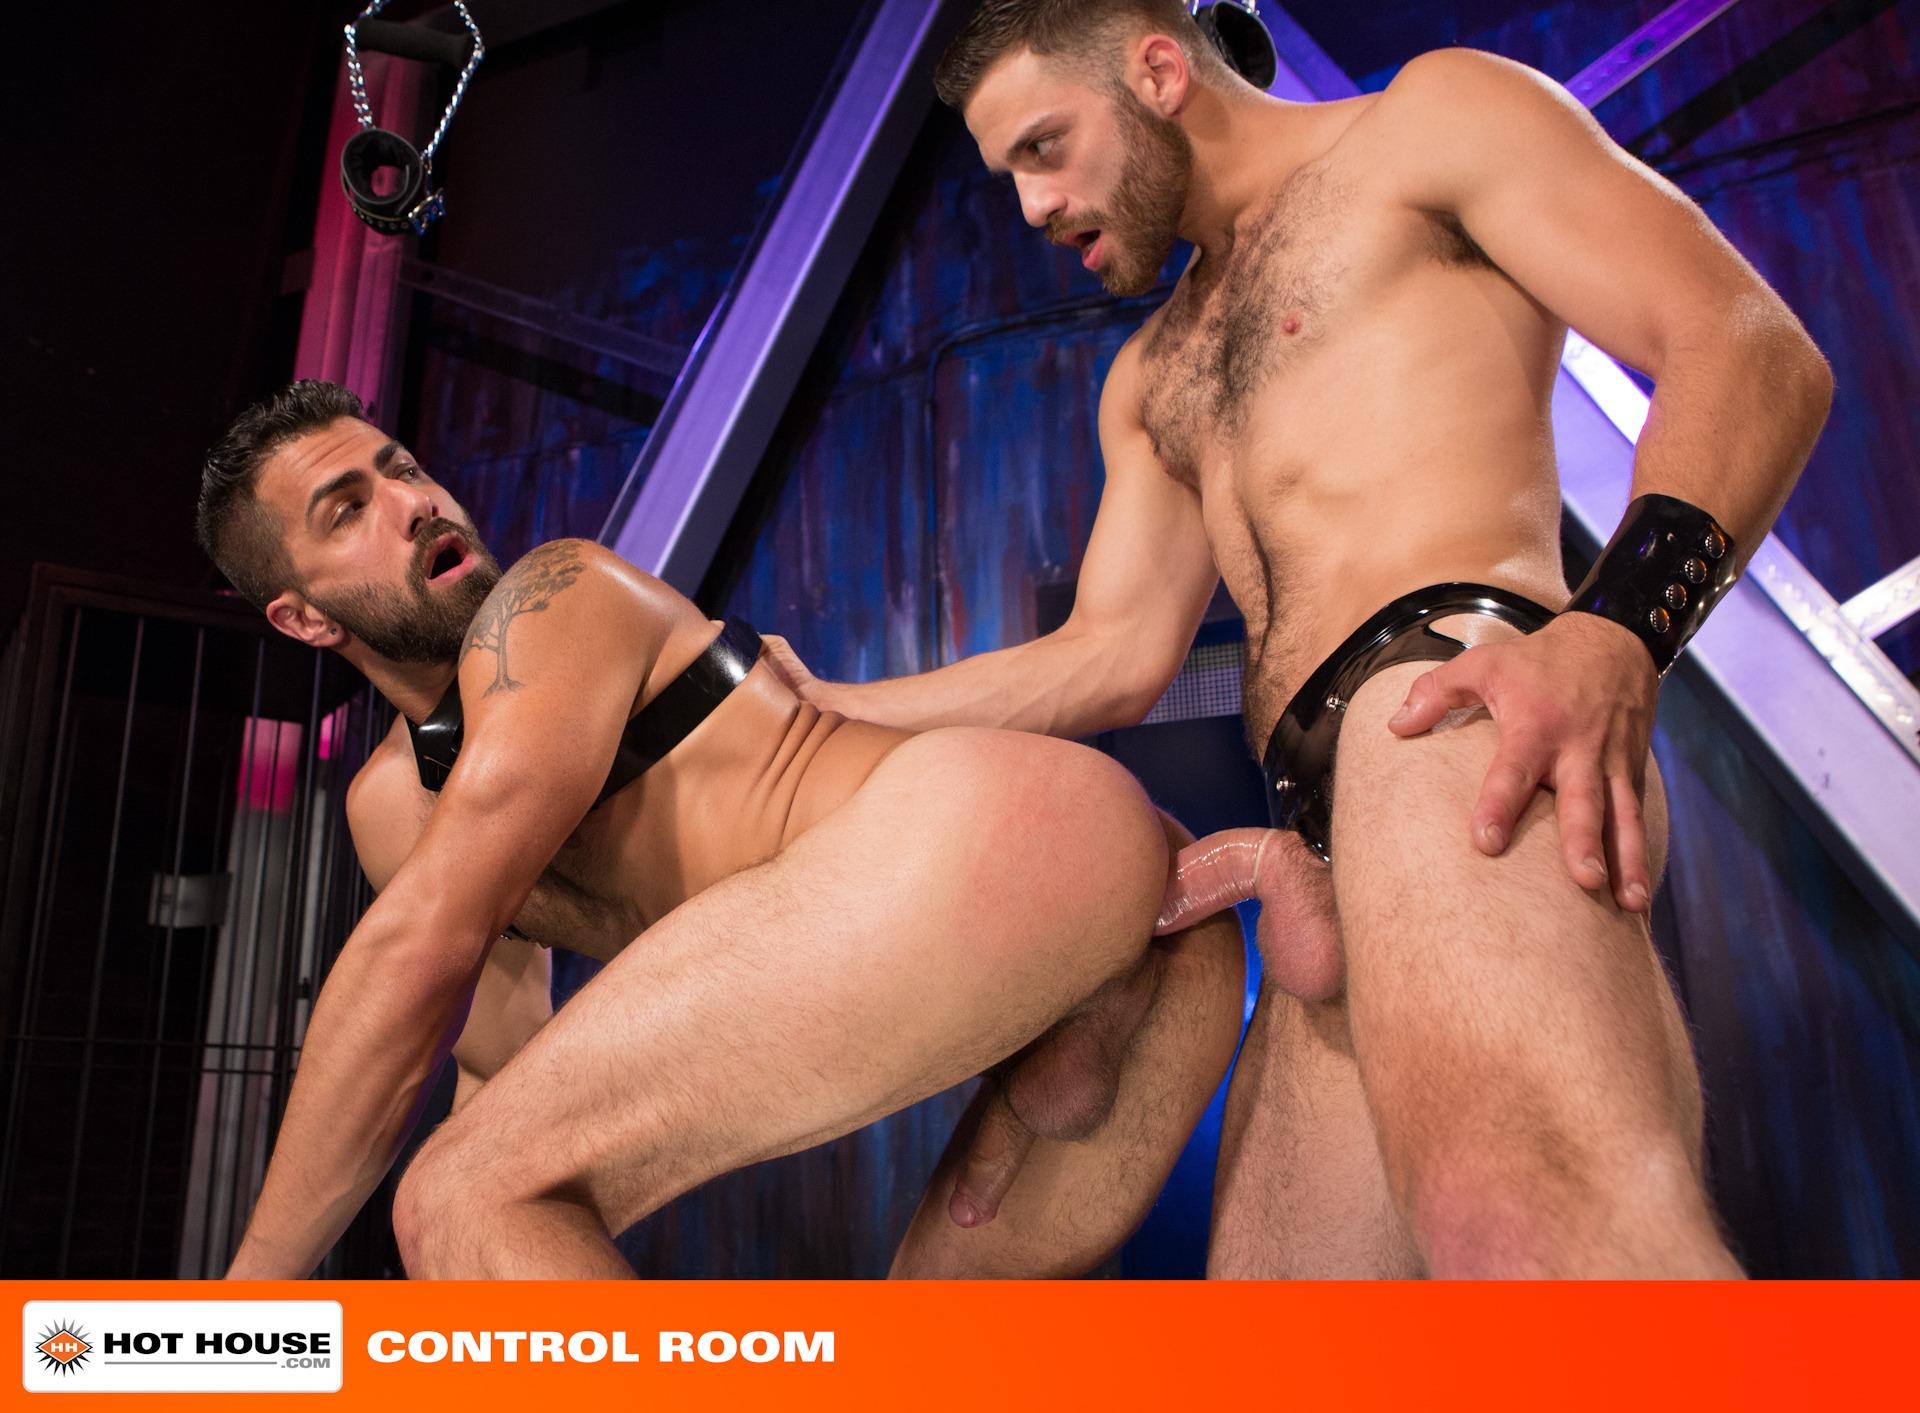 Adam Ramzi Porn Masters masters punish greedy slave – hairy guys in gay porn